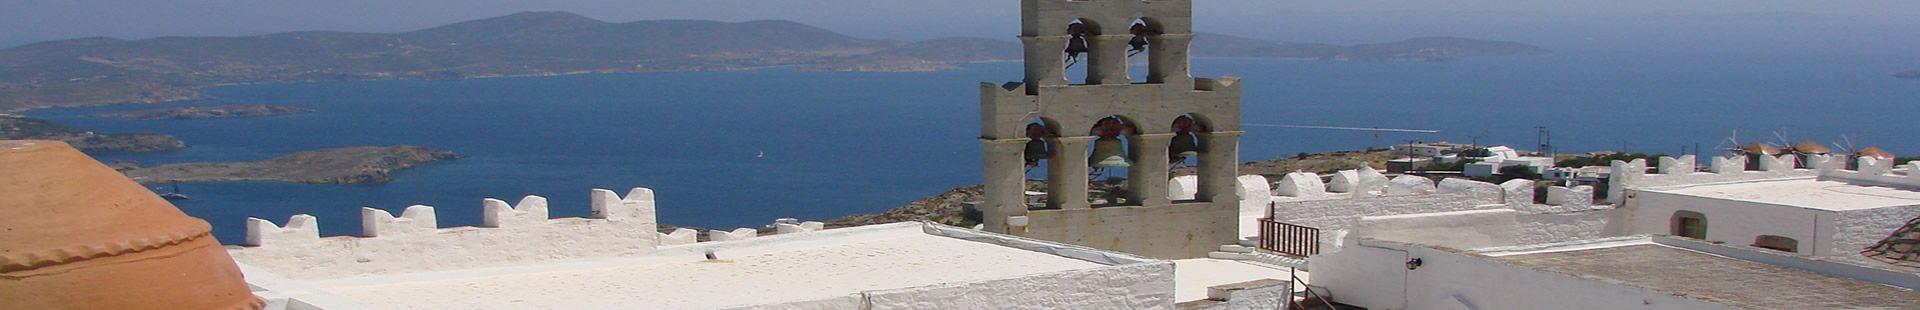 Аренда виллы без посредников греция